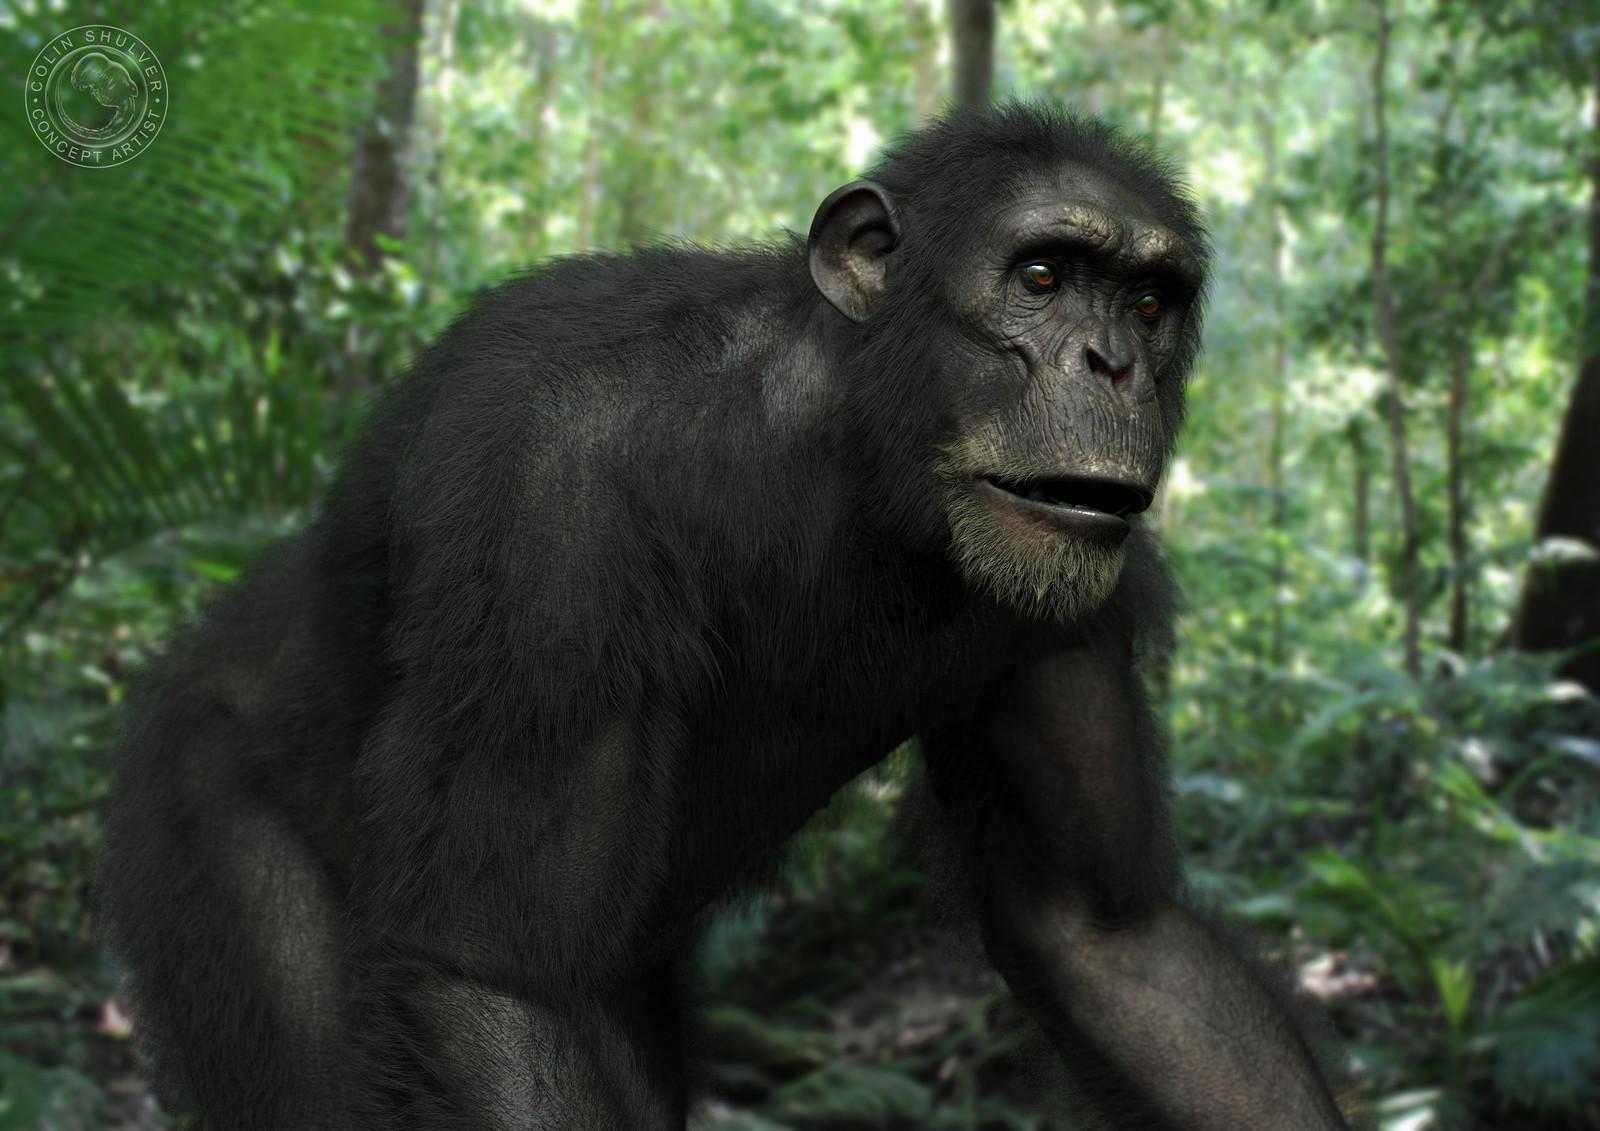 Chimpanzee - Part 3